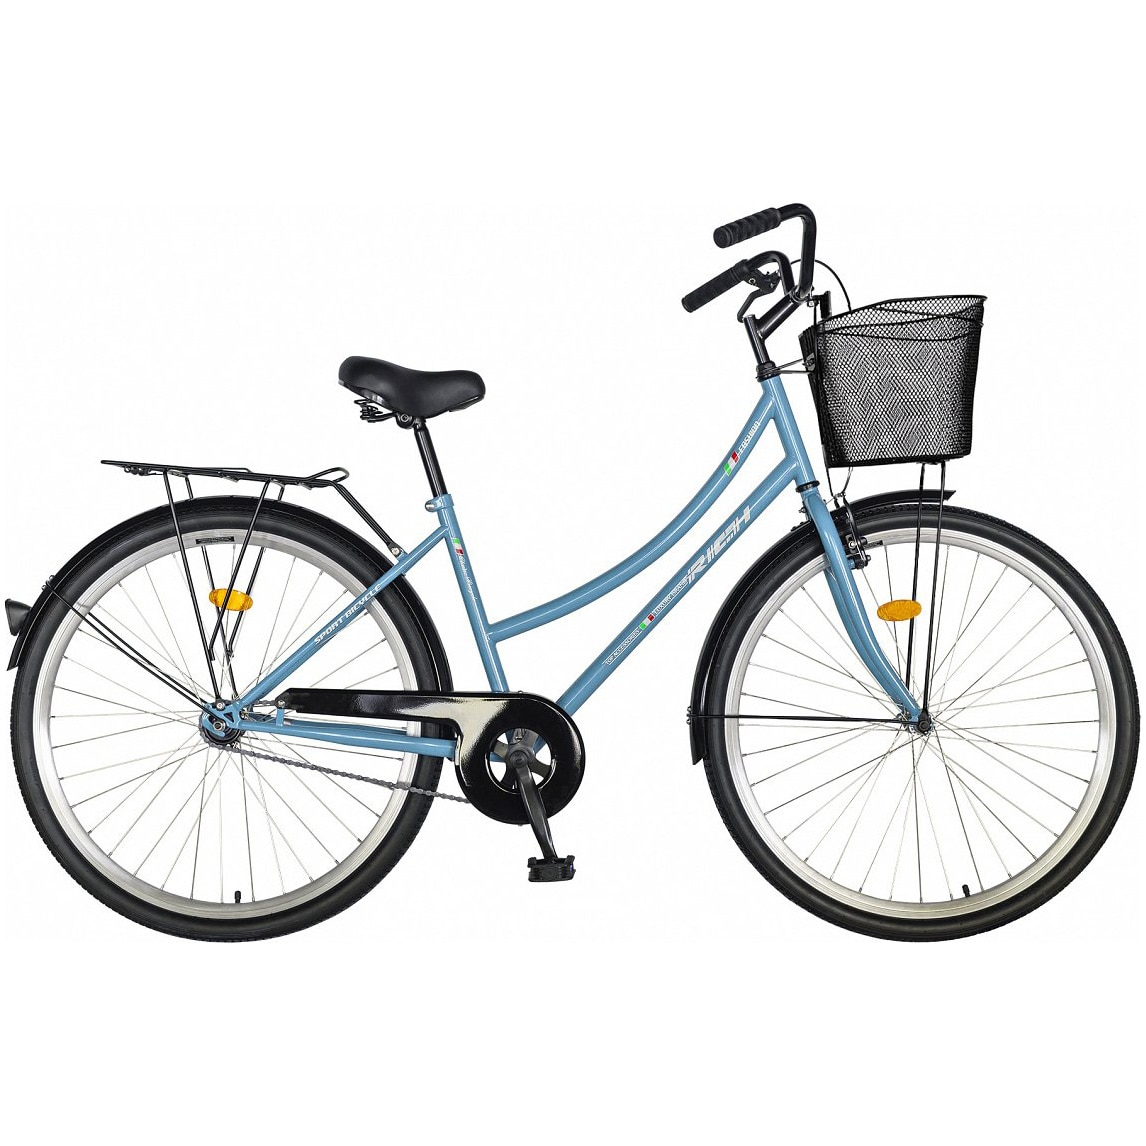 "Fotografie Bicicleta City 28"" Rich R2892A, Albastru"